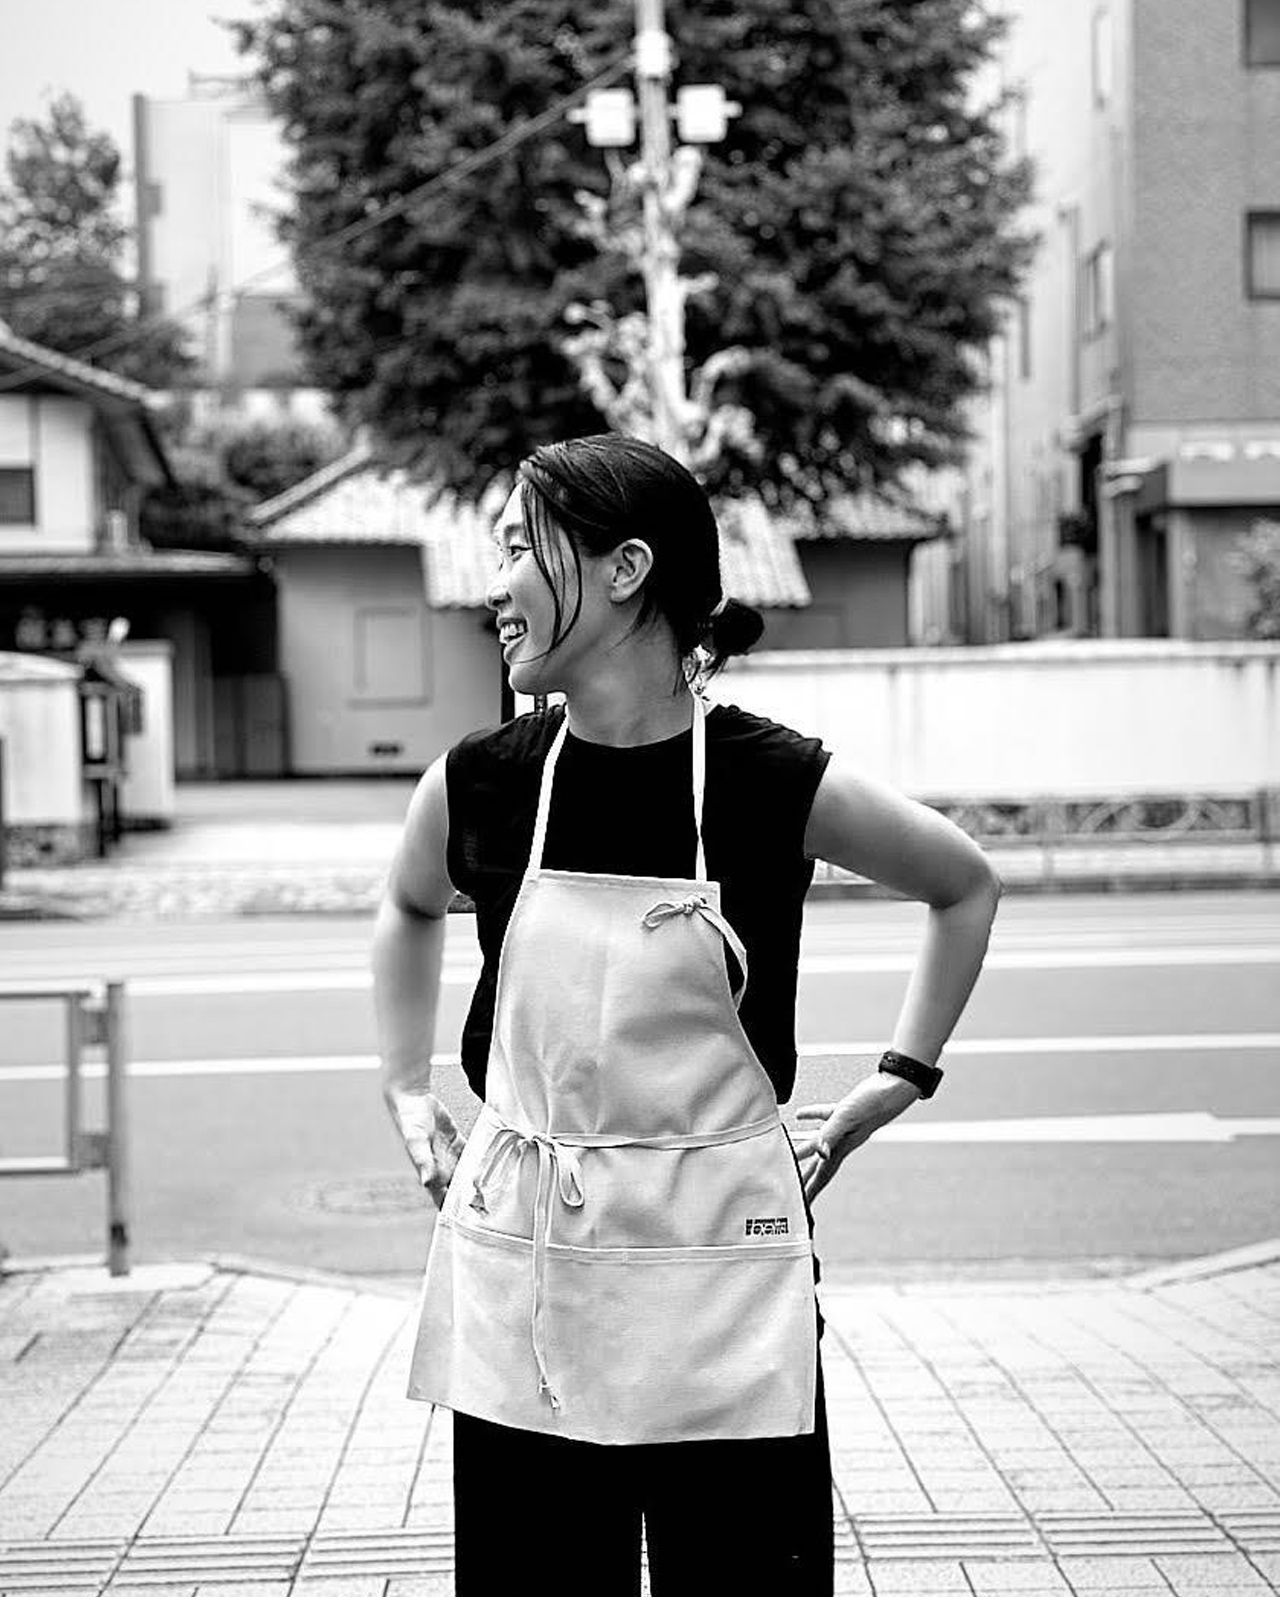 kale_01.jpg